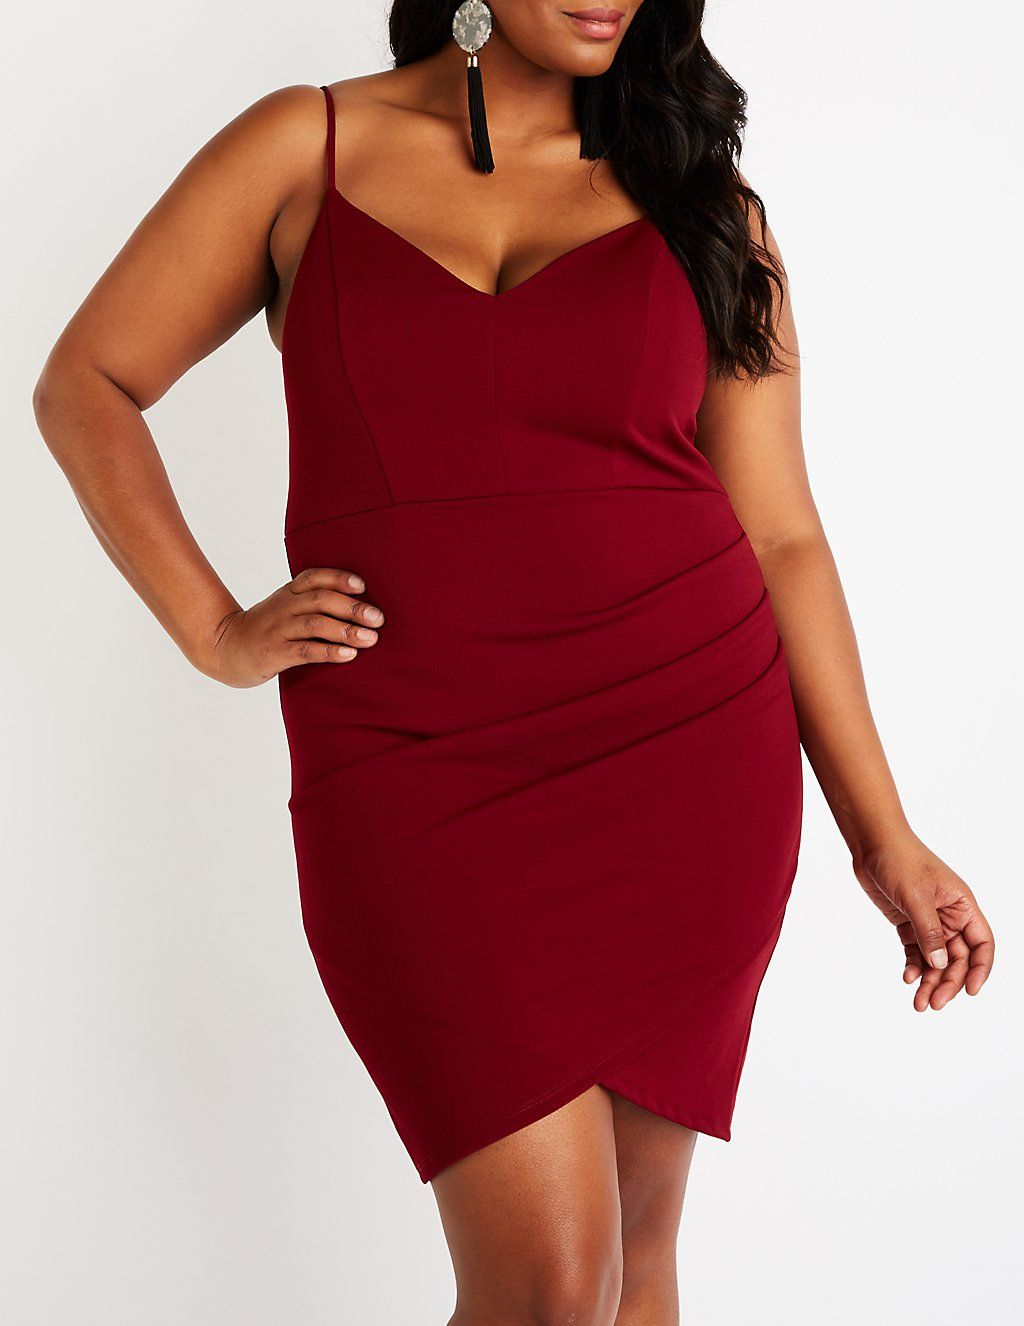 Plus Size V-Neck Bodycon Dress | Charlotte Russe | Plus Evening Wear ...